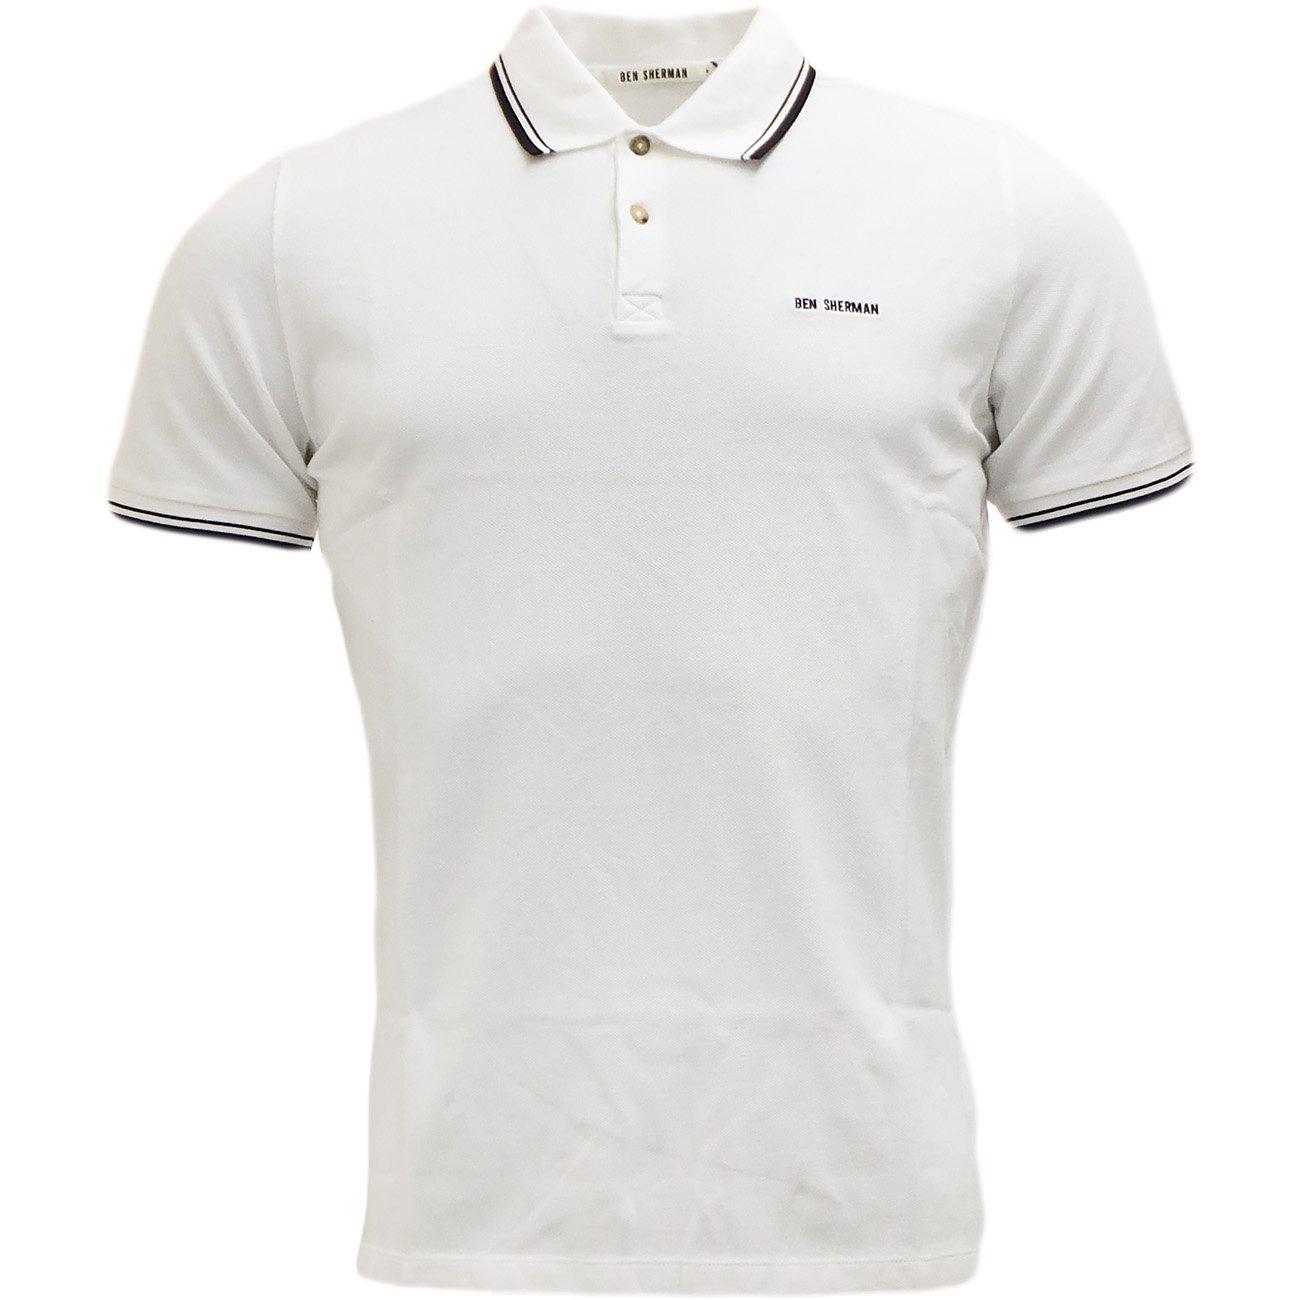 Ben Sherman Herren Poloshirt Polo-Shirt, Kragen, Bündchen Original Uni, S,  M, L, XL, XXL: Amazon.de: Bekleidung